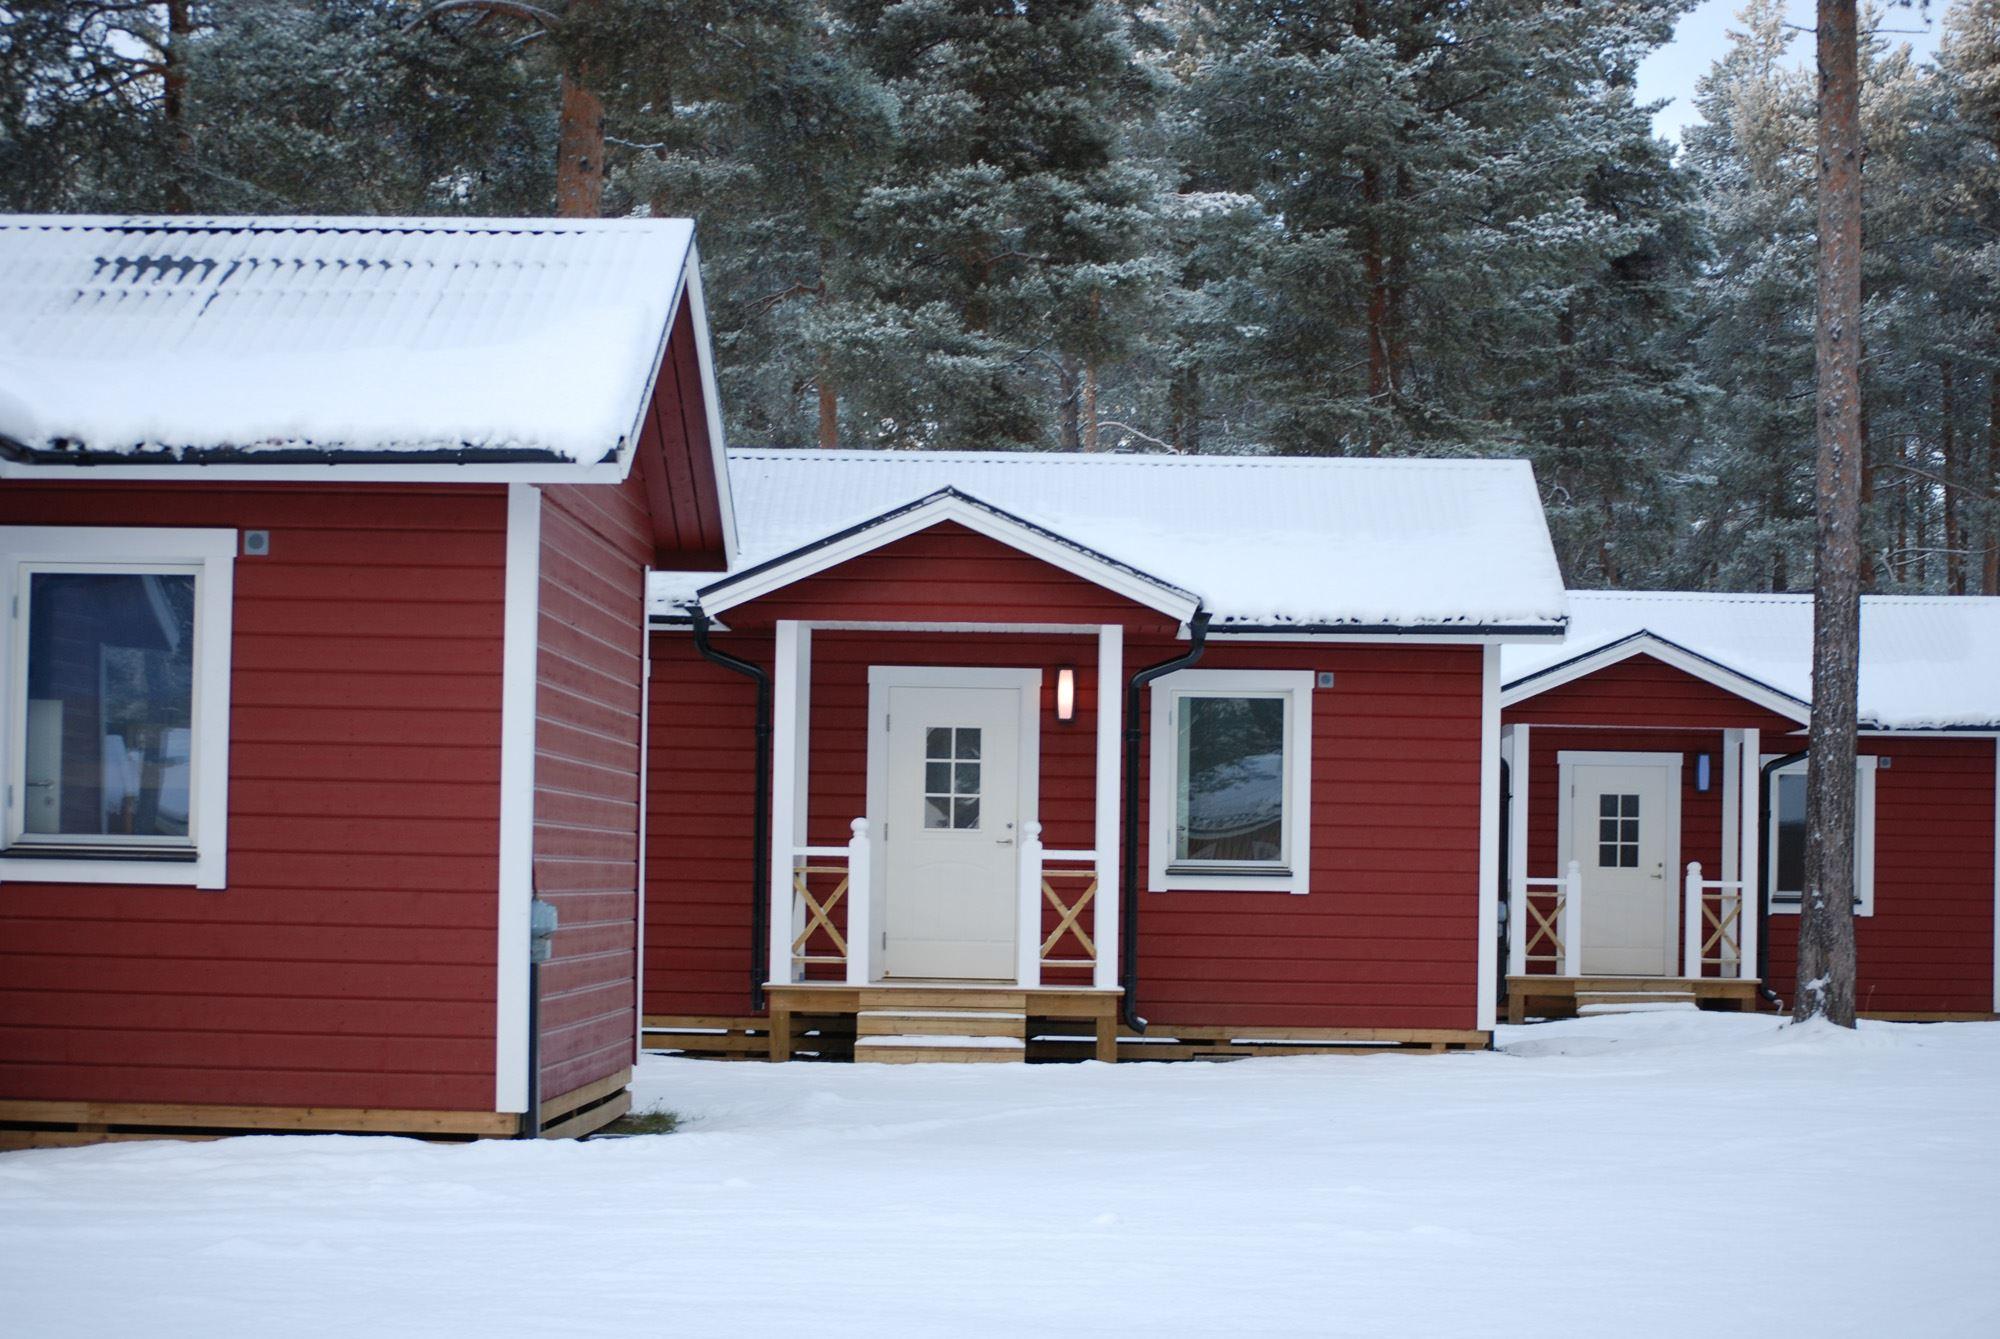 Arctic Camp Jokkmokk/Cottages